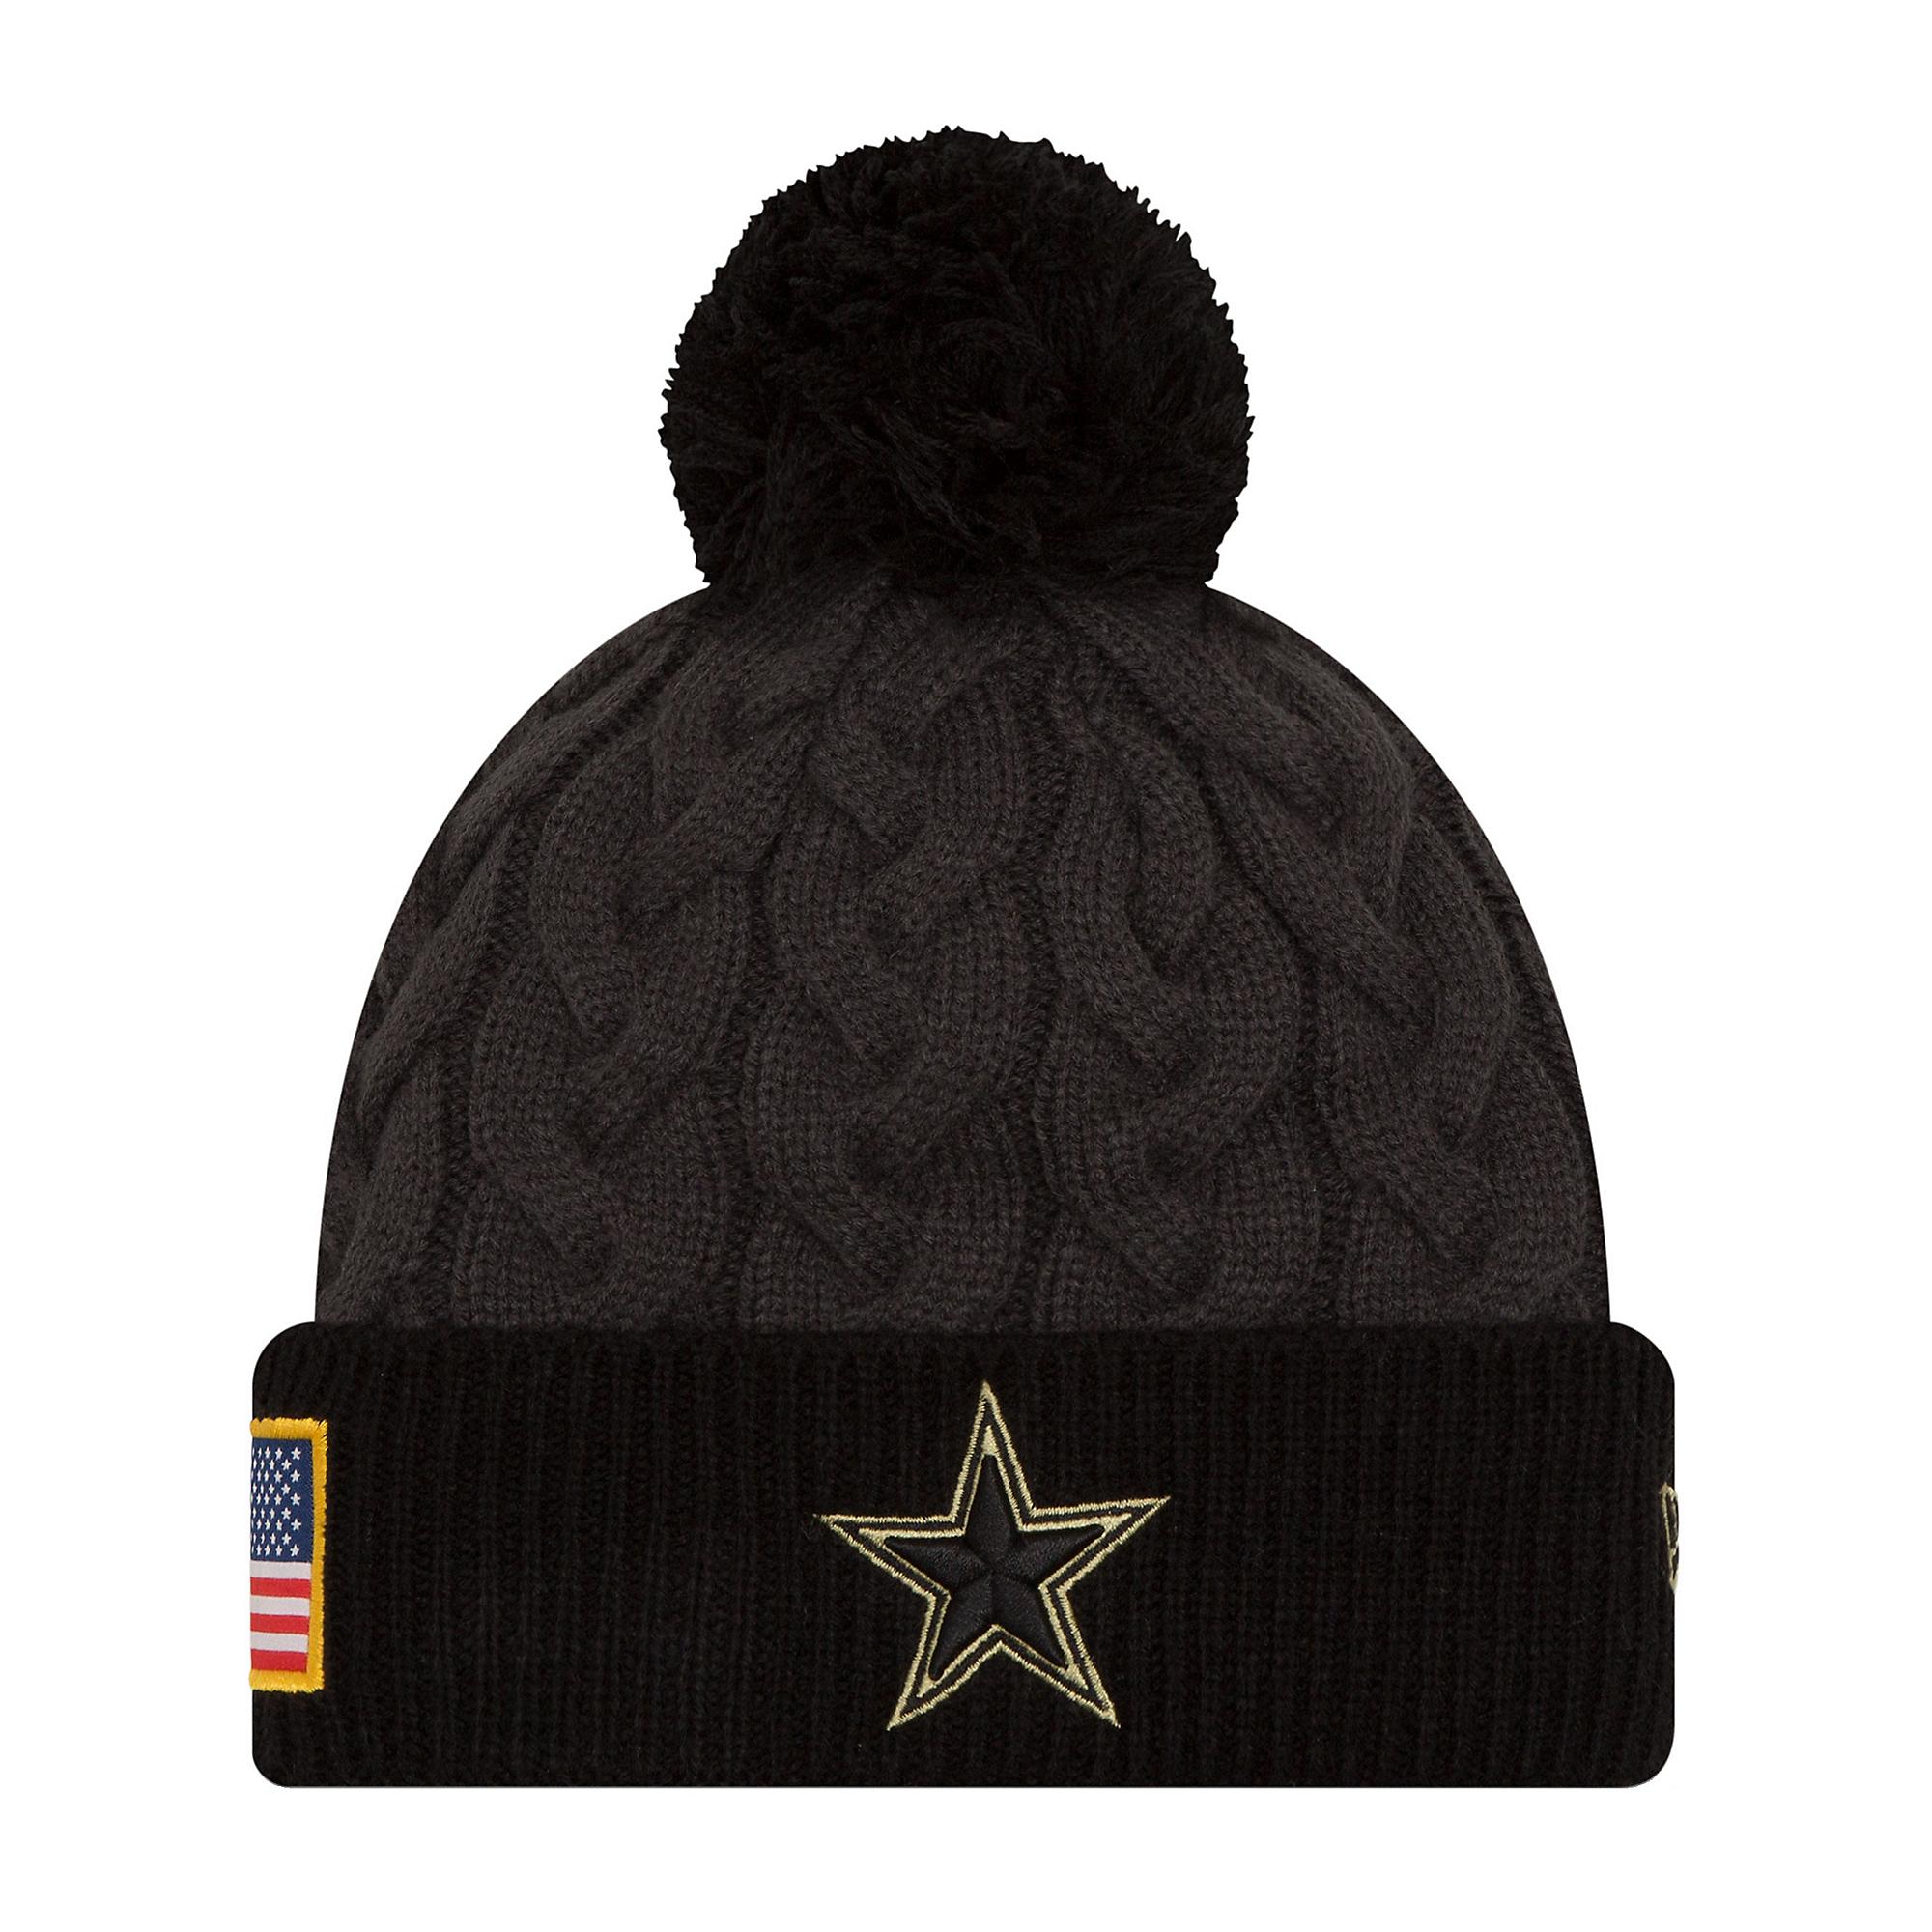 53cee08d47b Dallas Cowboys New Era Salute to Service Womens Knit Hat